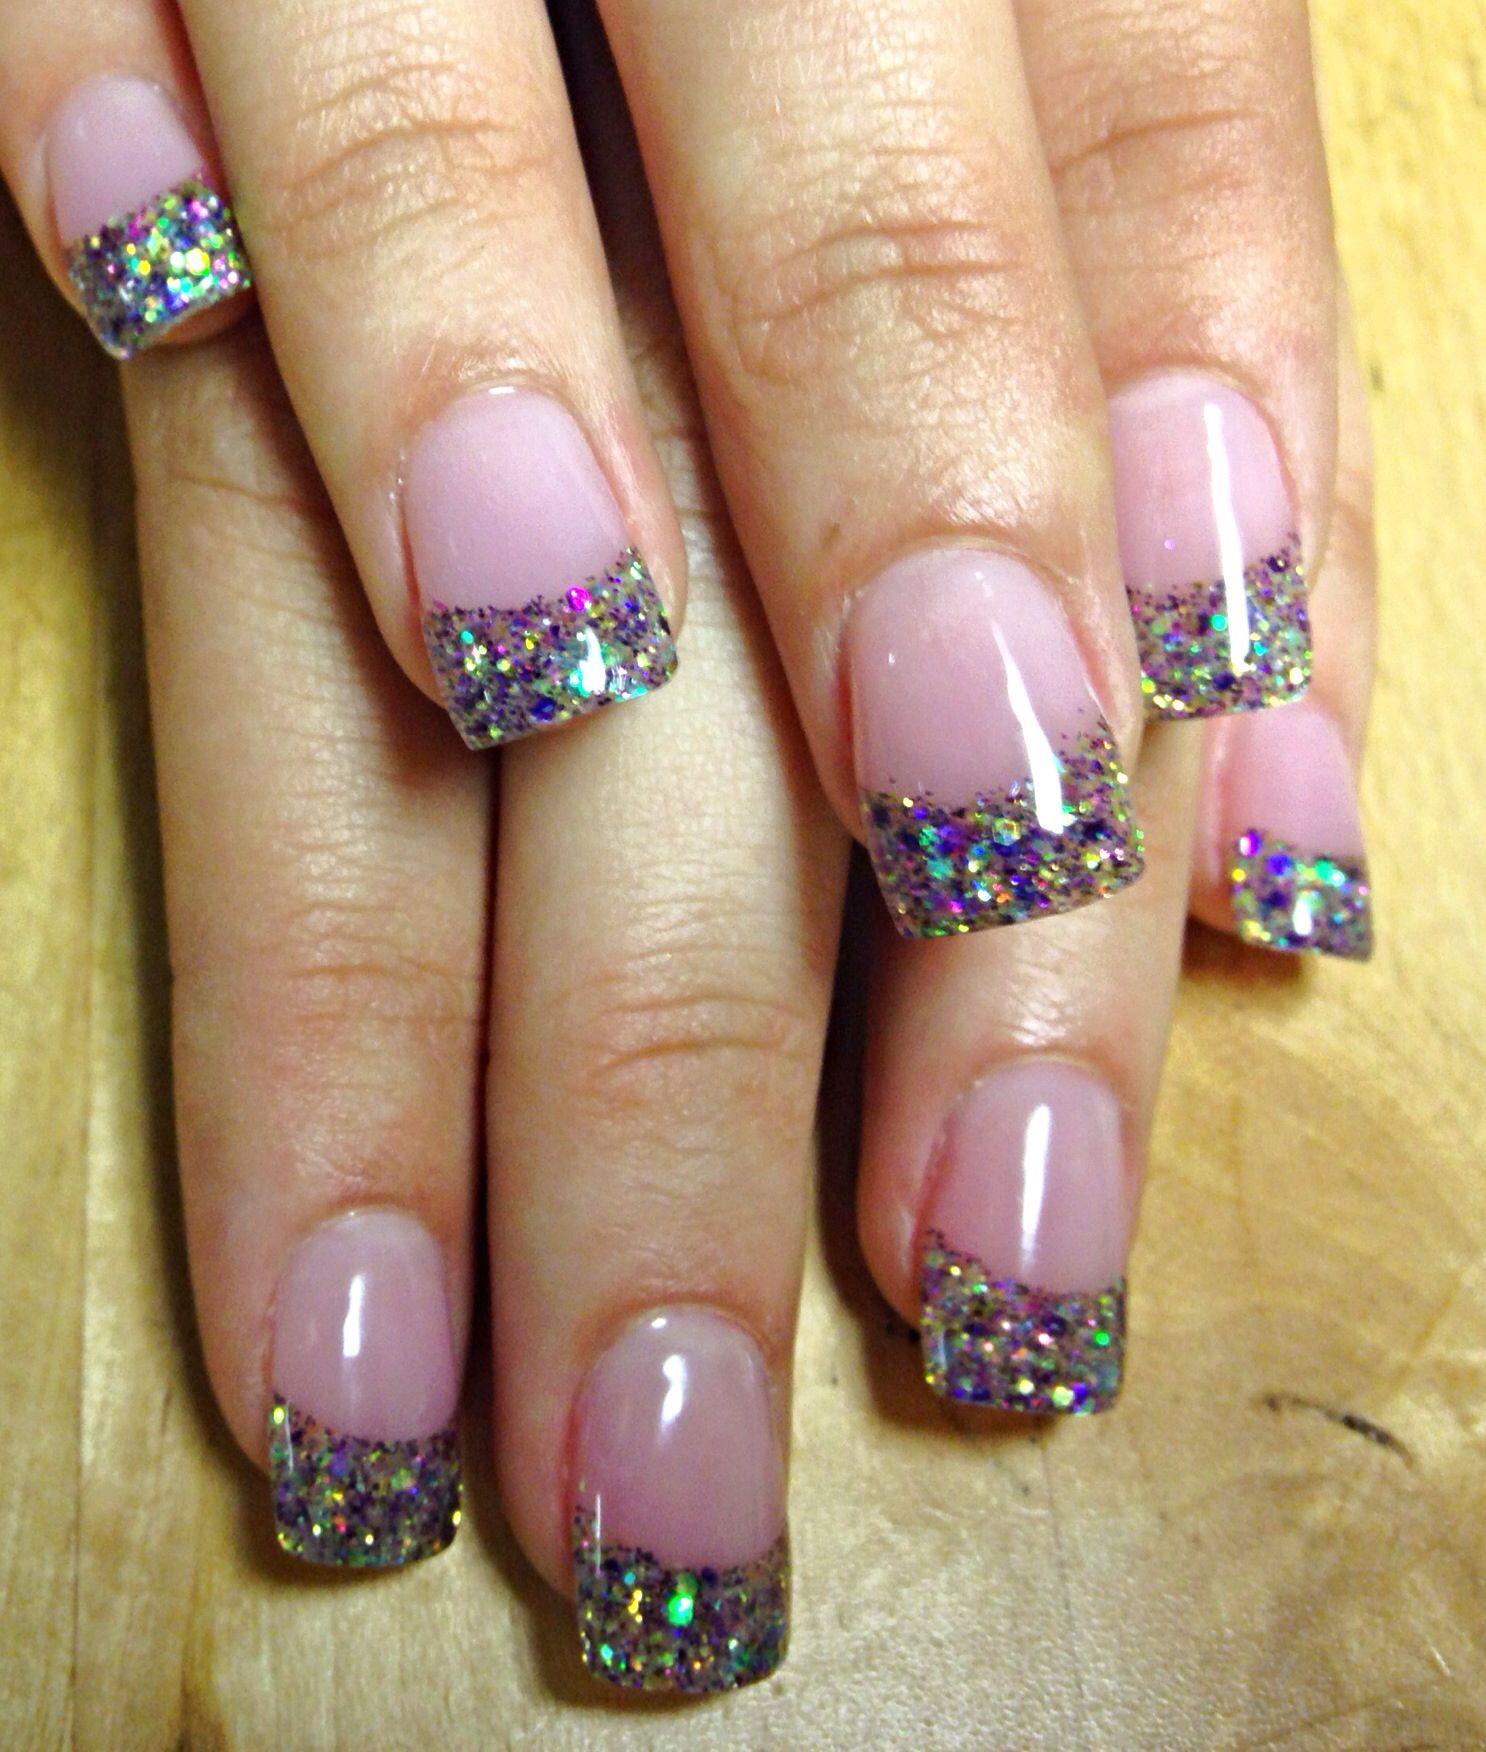 Acrylic Nails Seashell Sparkle Nail Designs Trendy Nails Super Nails